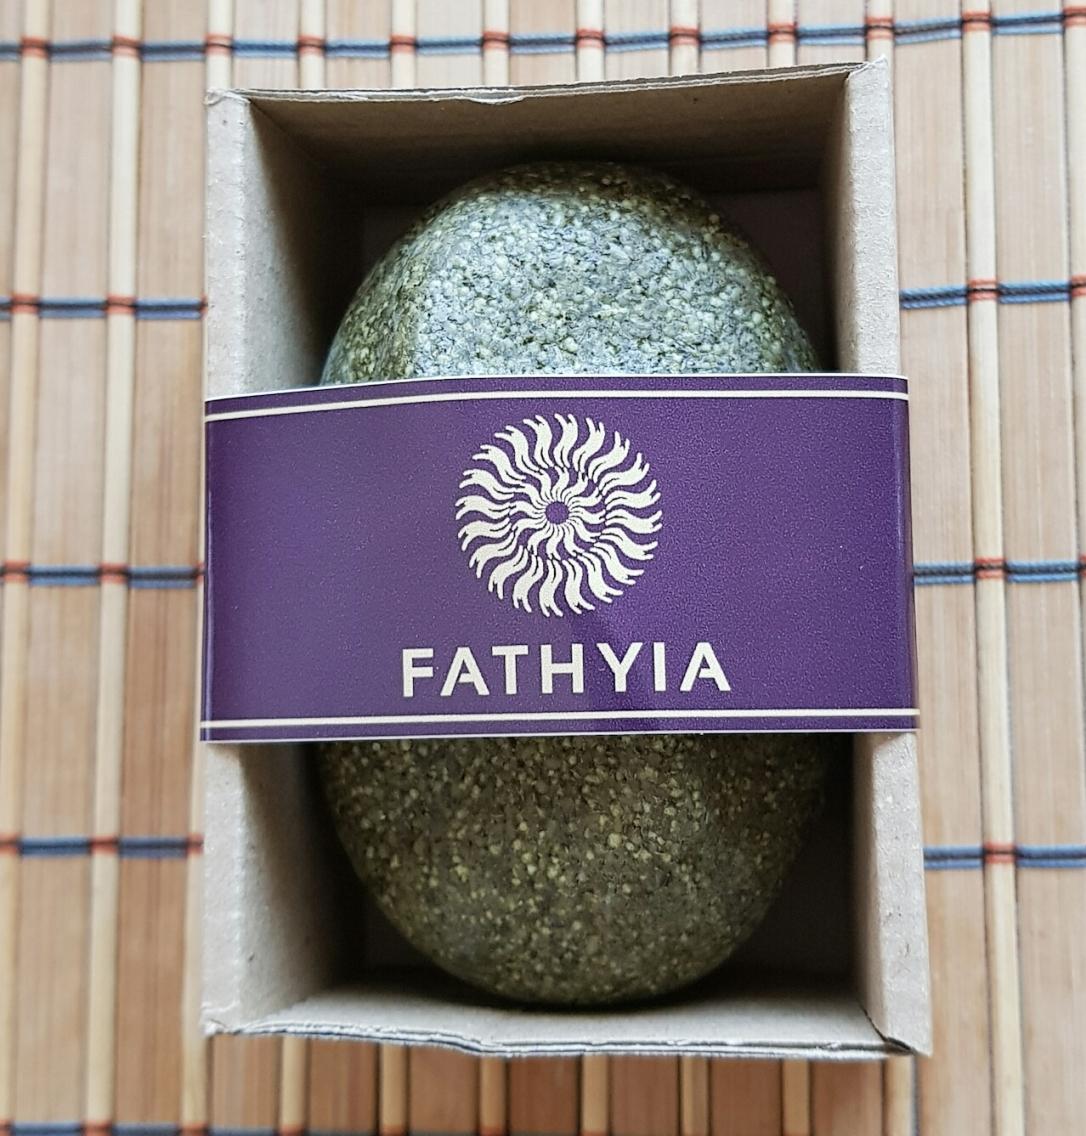 Sampon solid bar vegan Cruelty-free FATHYIA